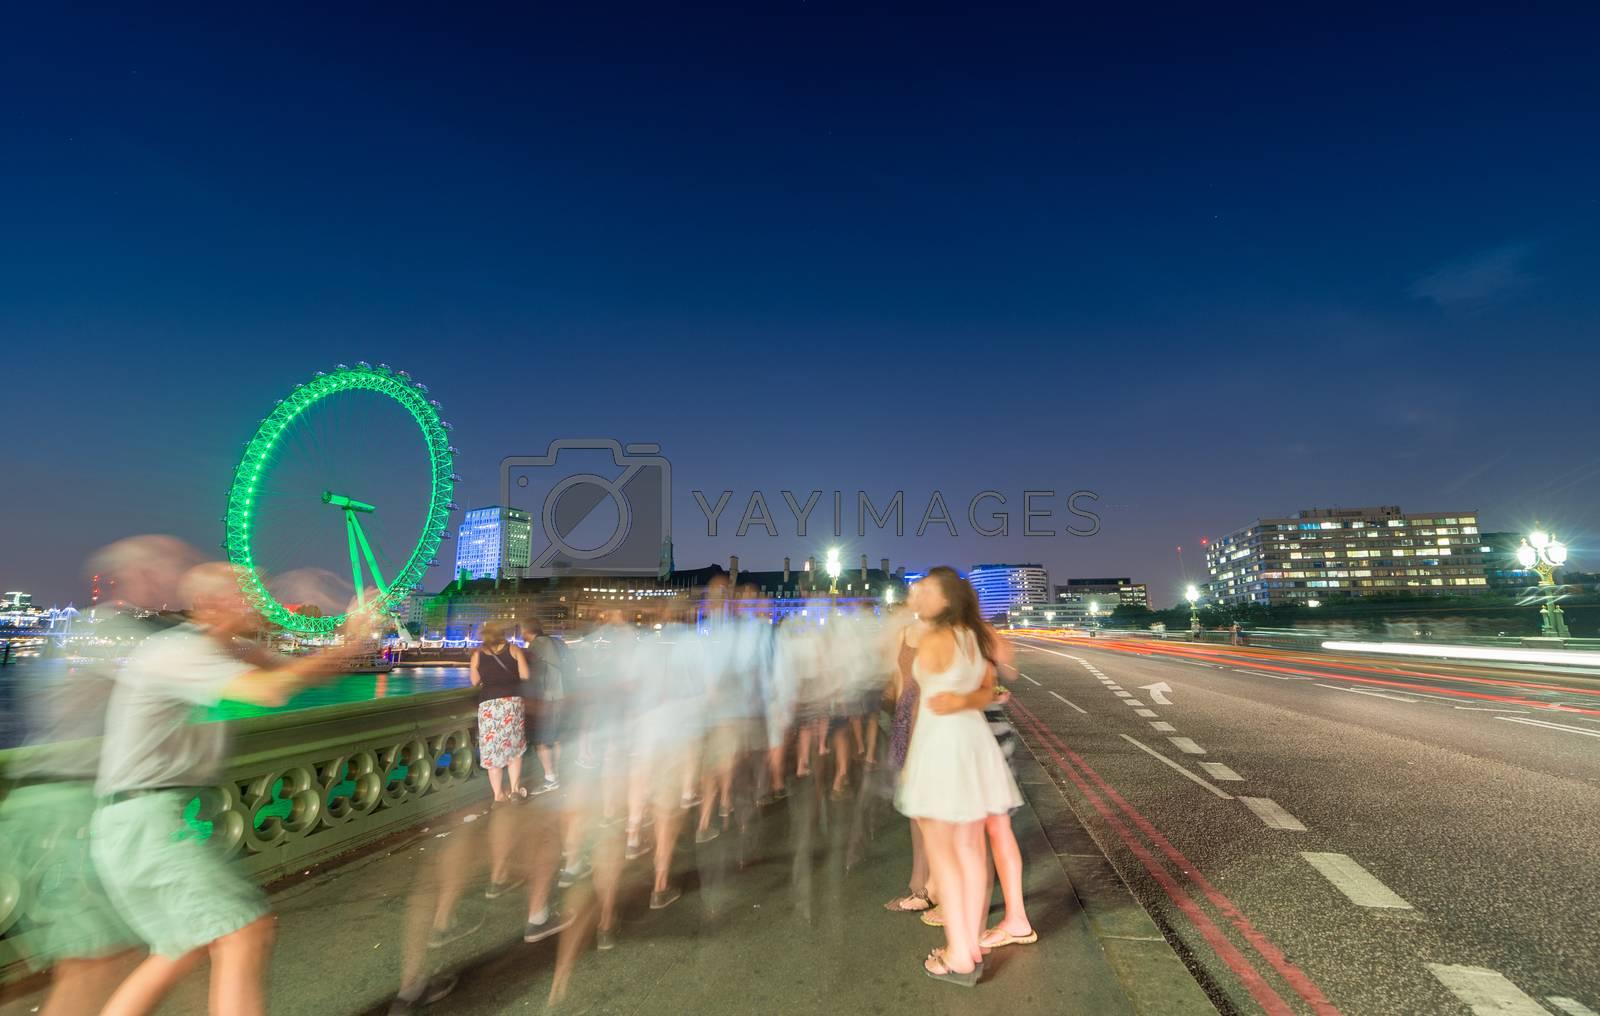 Royalty free image of Tourists enjoying Westminster Bridge at night. Blurerd moving pe by jovannig